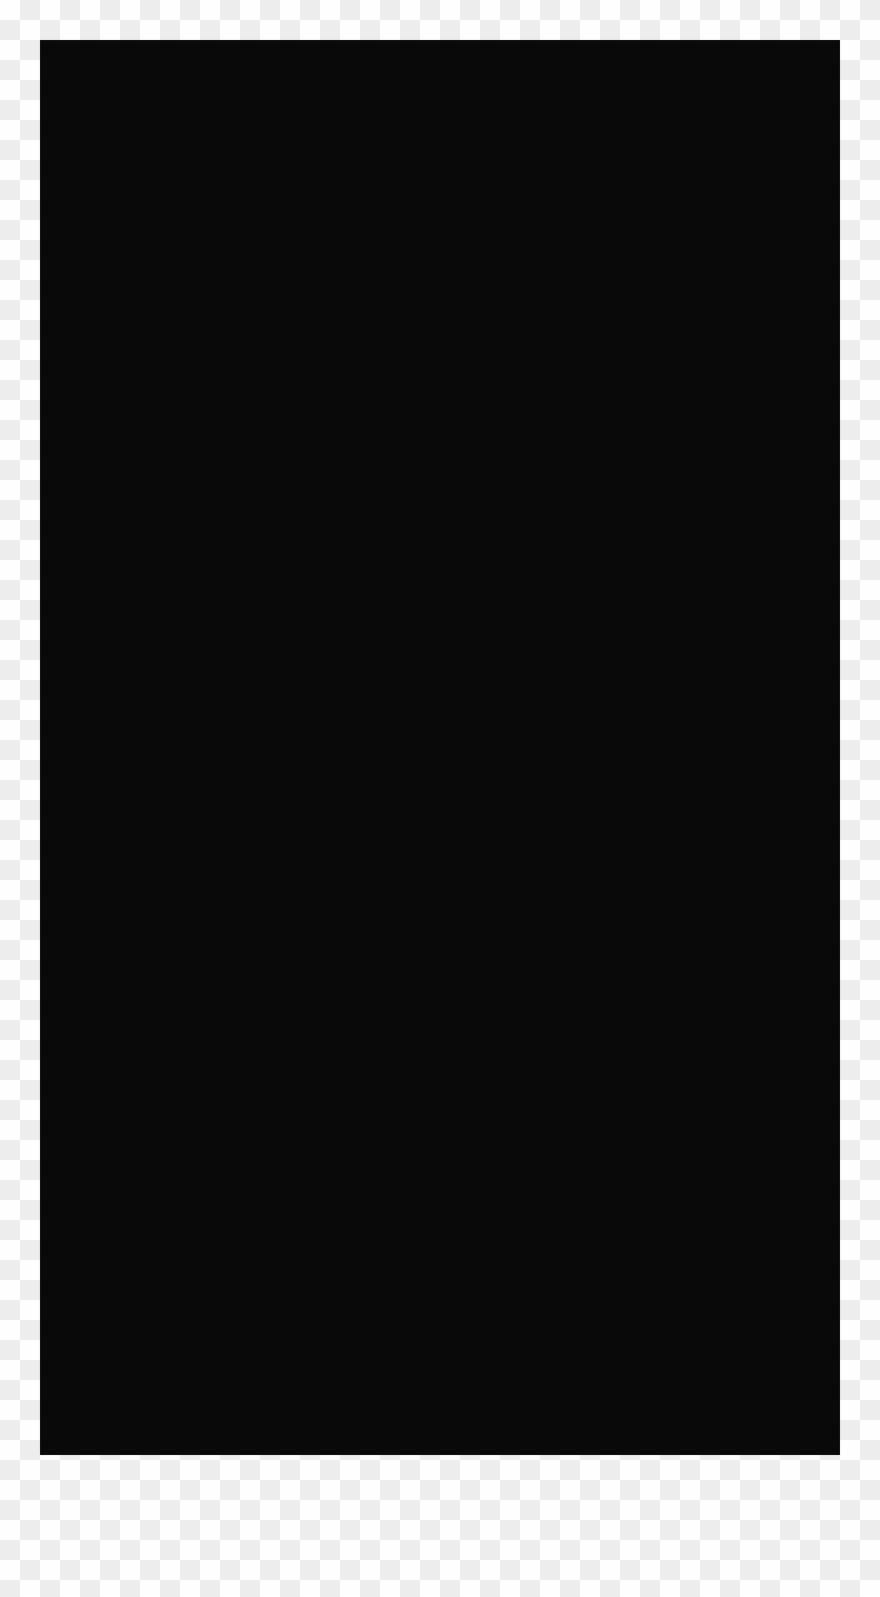 Clipart Golfer Silhouette Clip Art.